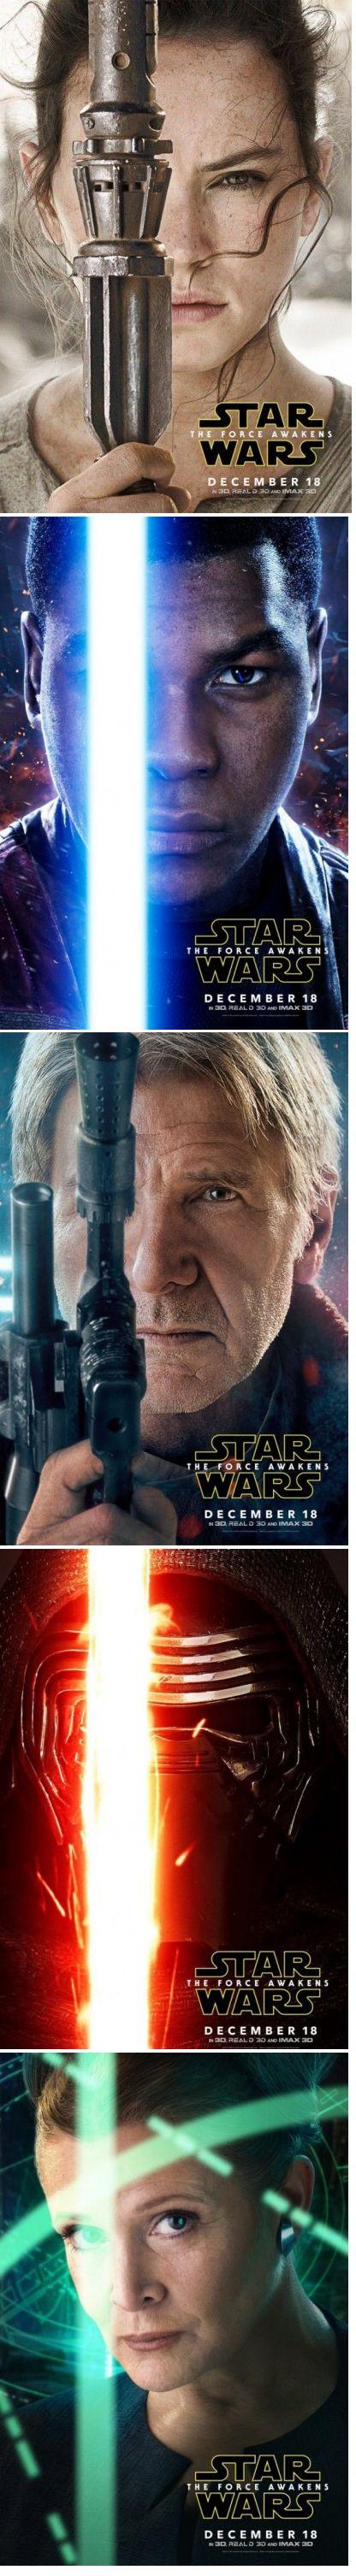 Star Wars: Episode VII – The Force Awakens (2015) [character posters] #starwars #theforceawakens